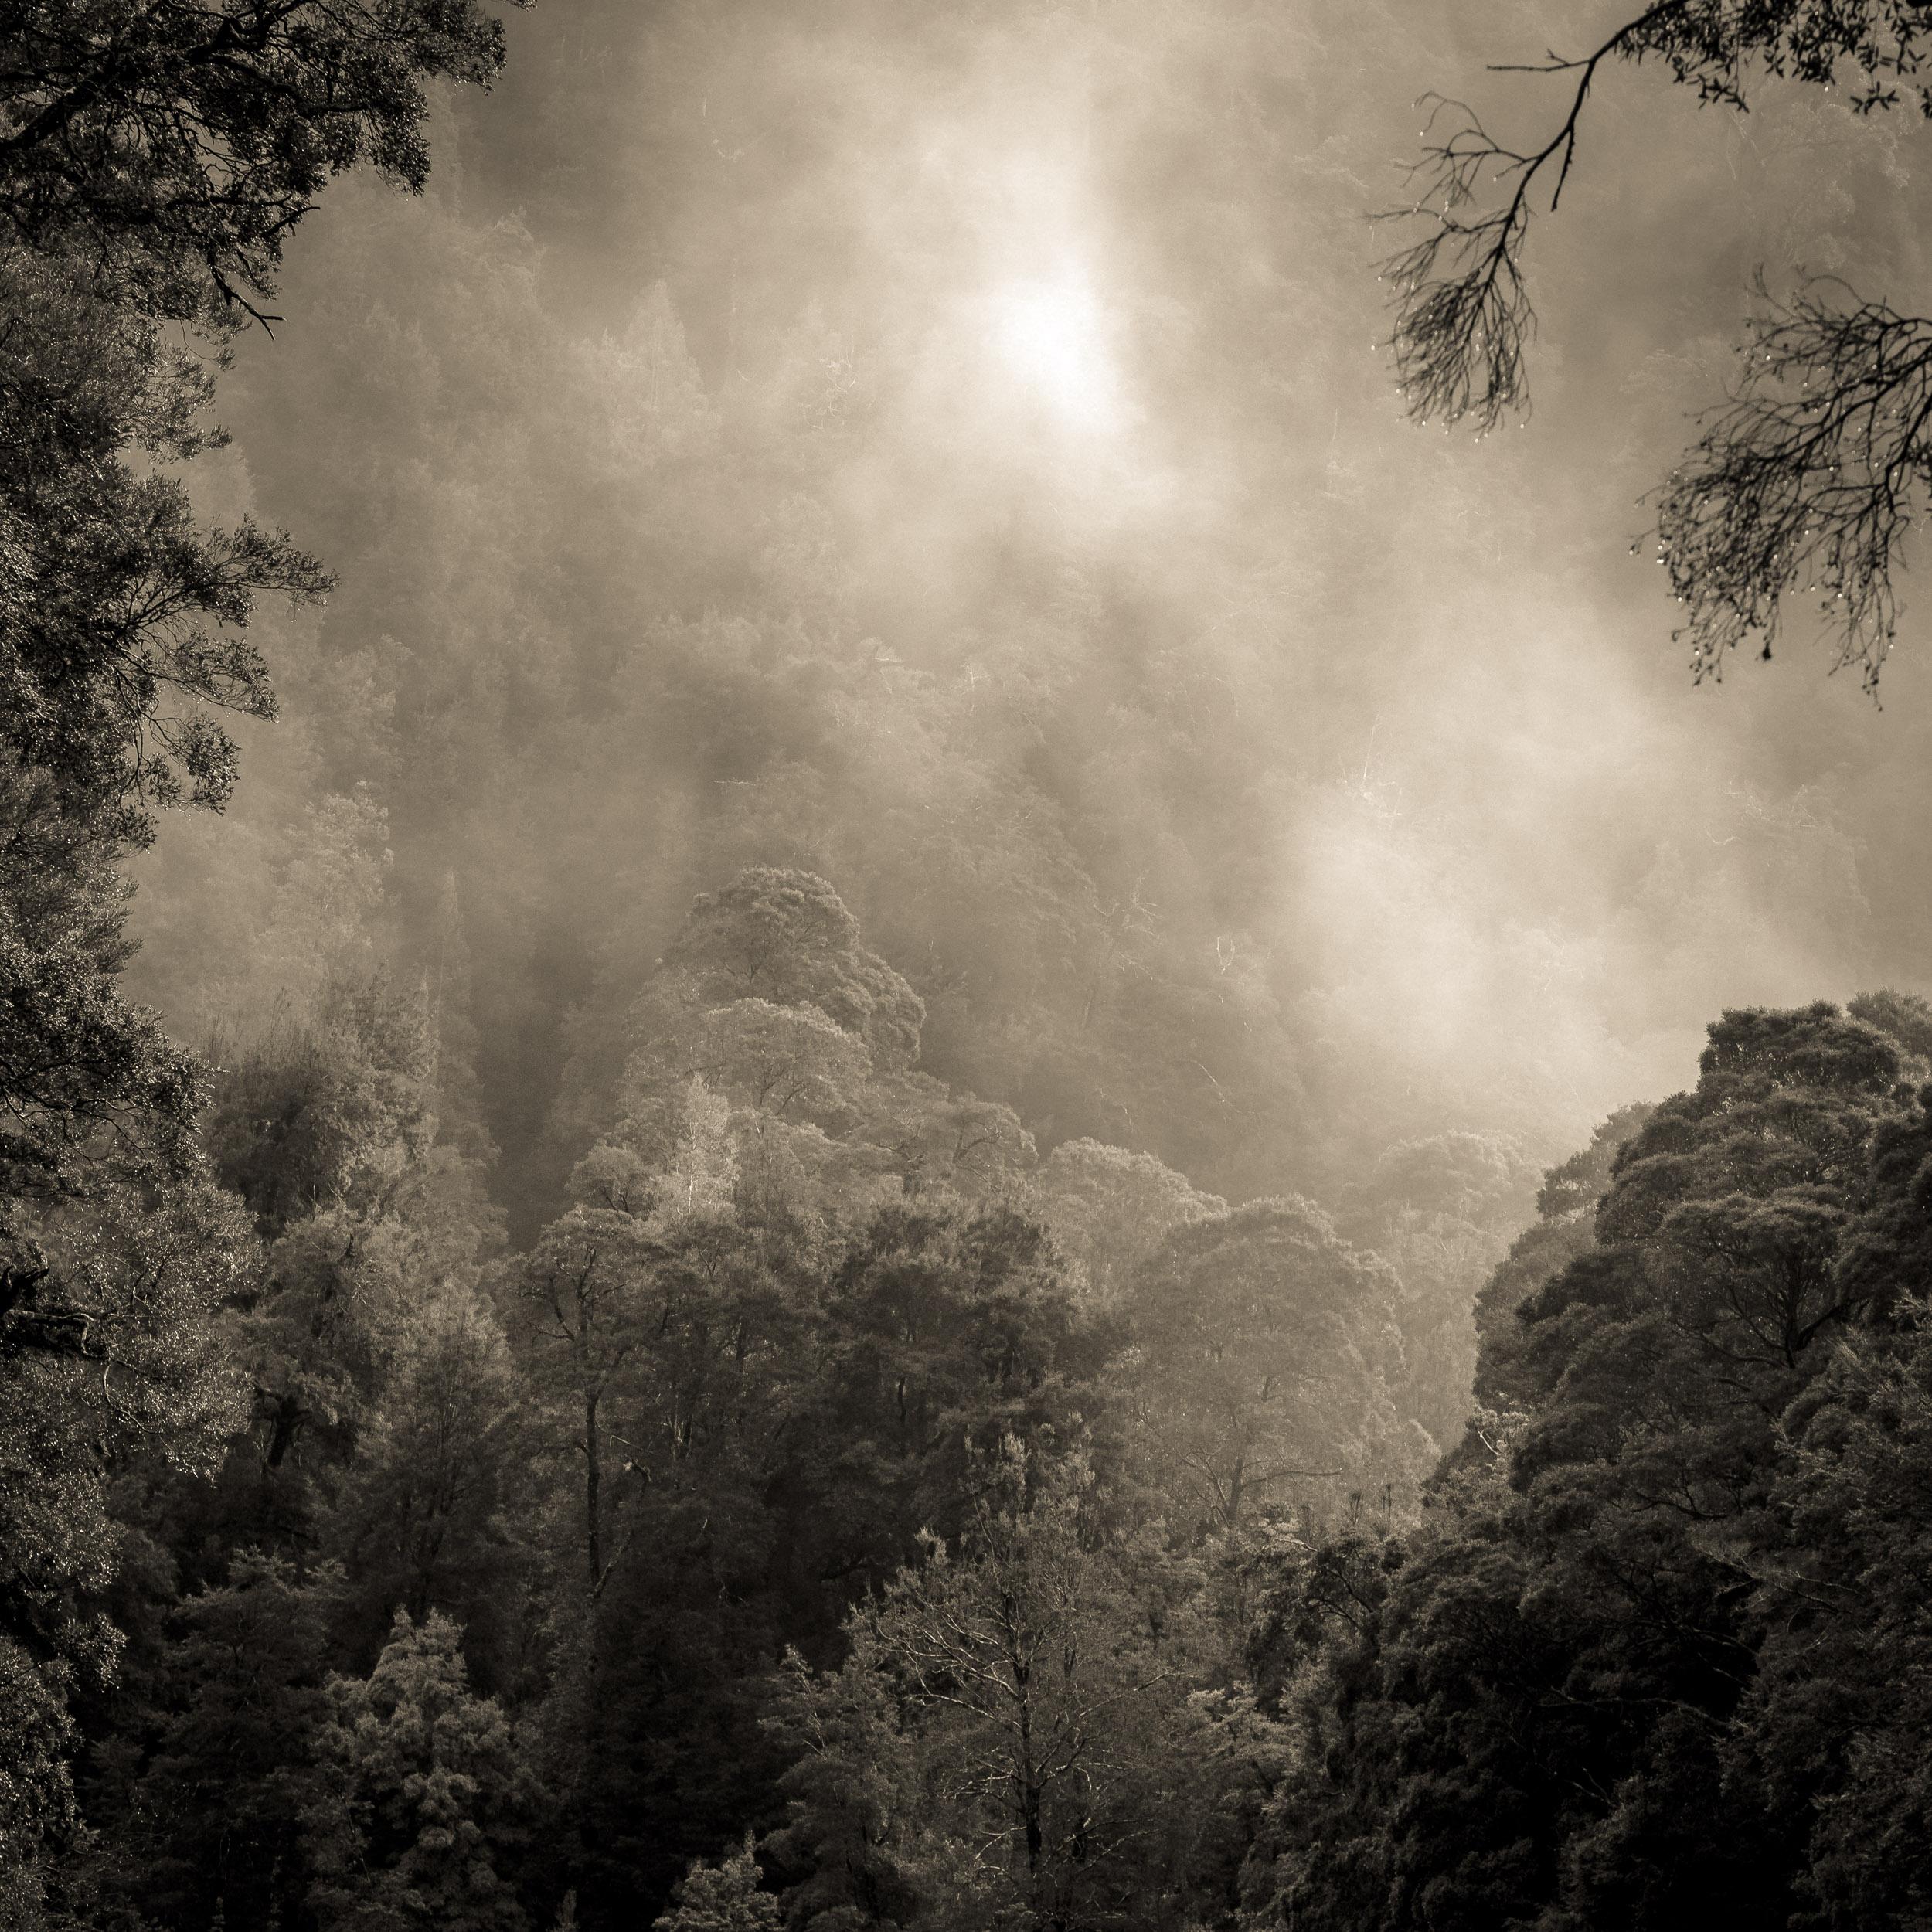 Mist in the Tarkine Wilderness - The Donaldson River, Corrina, The Tarkine. Copyright © Len Metcalf 2017